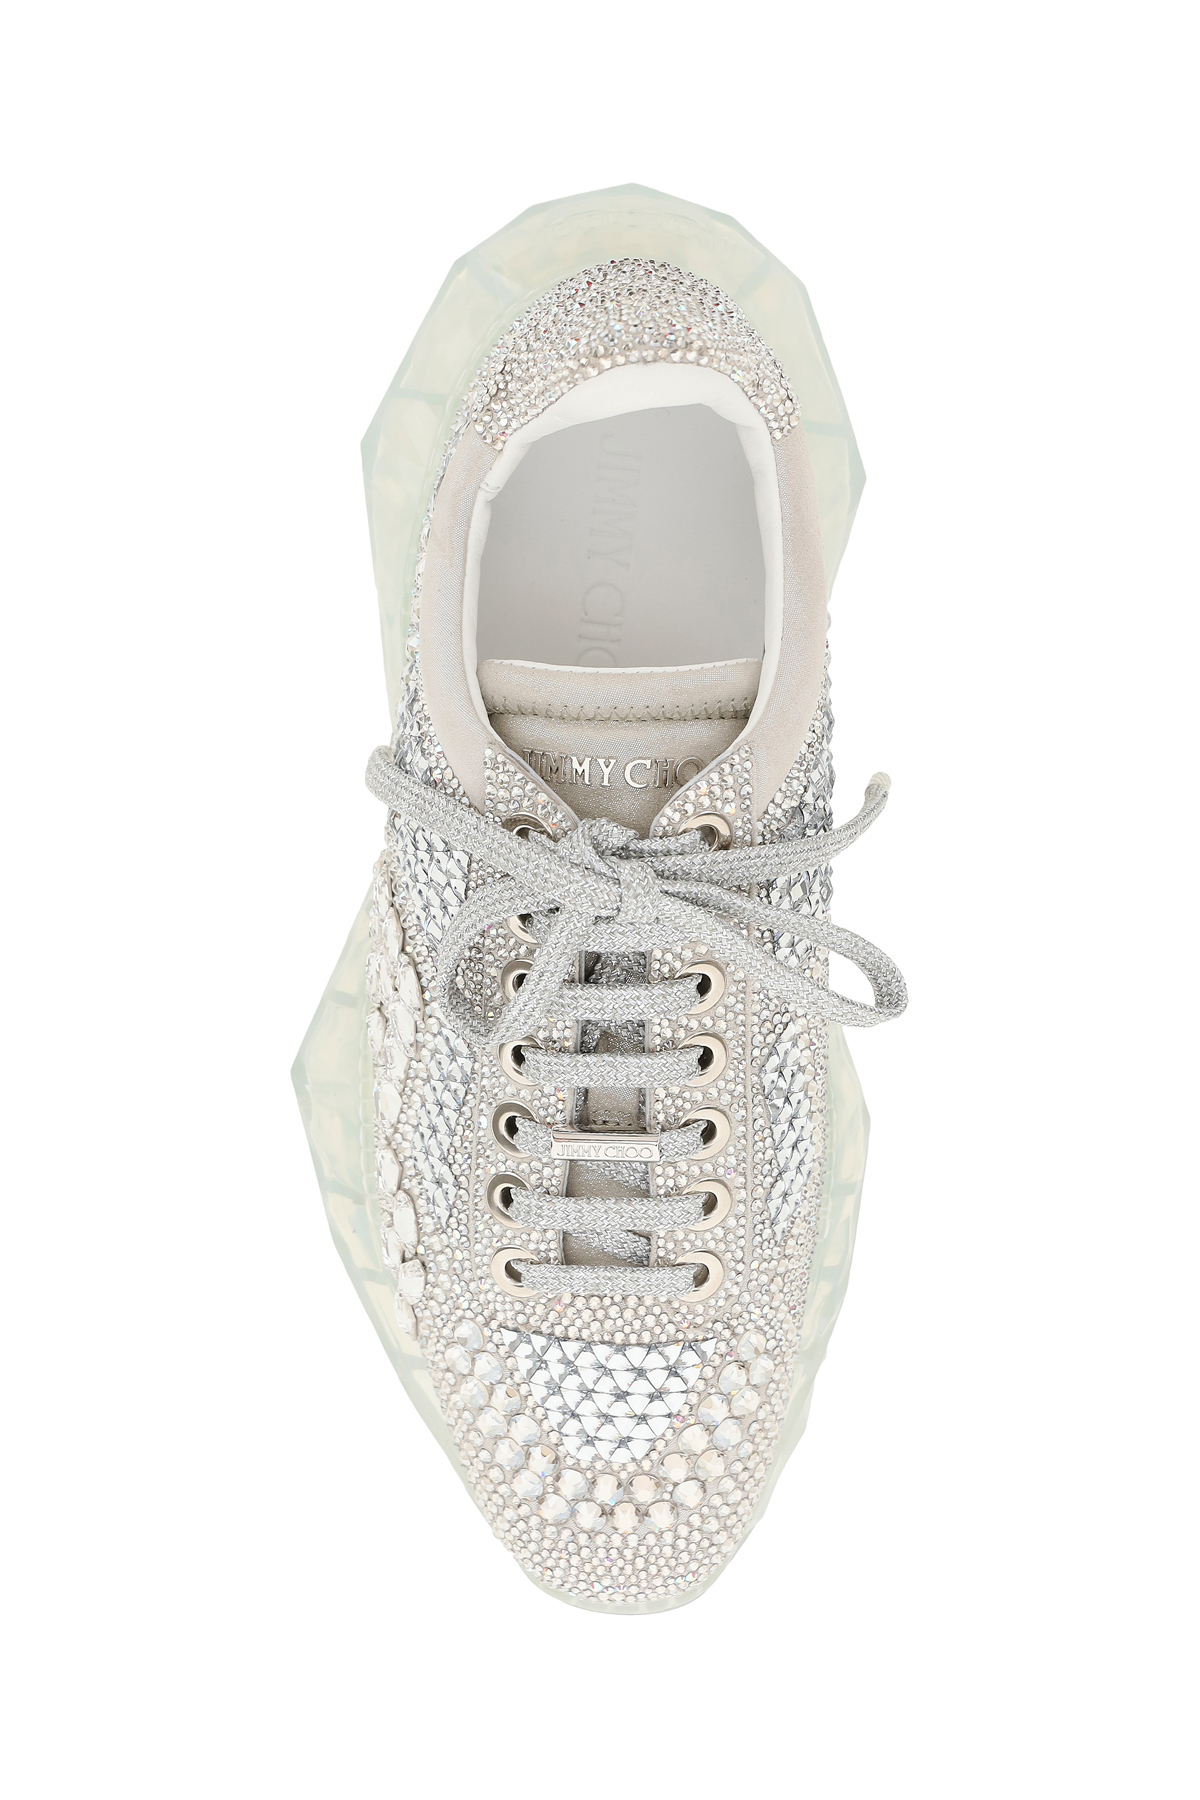 Jimmy choo sneakers diamond f con cristalli